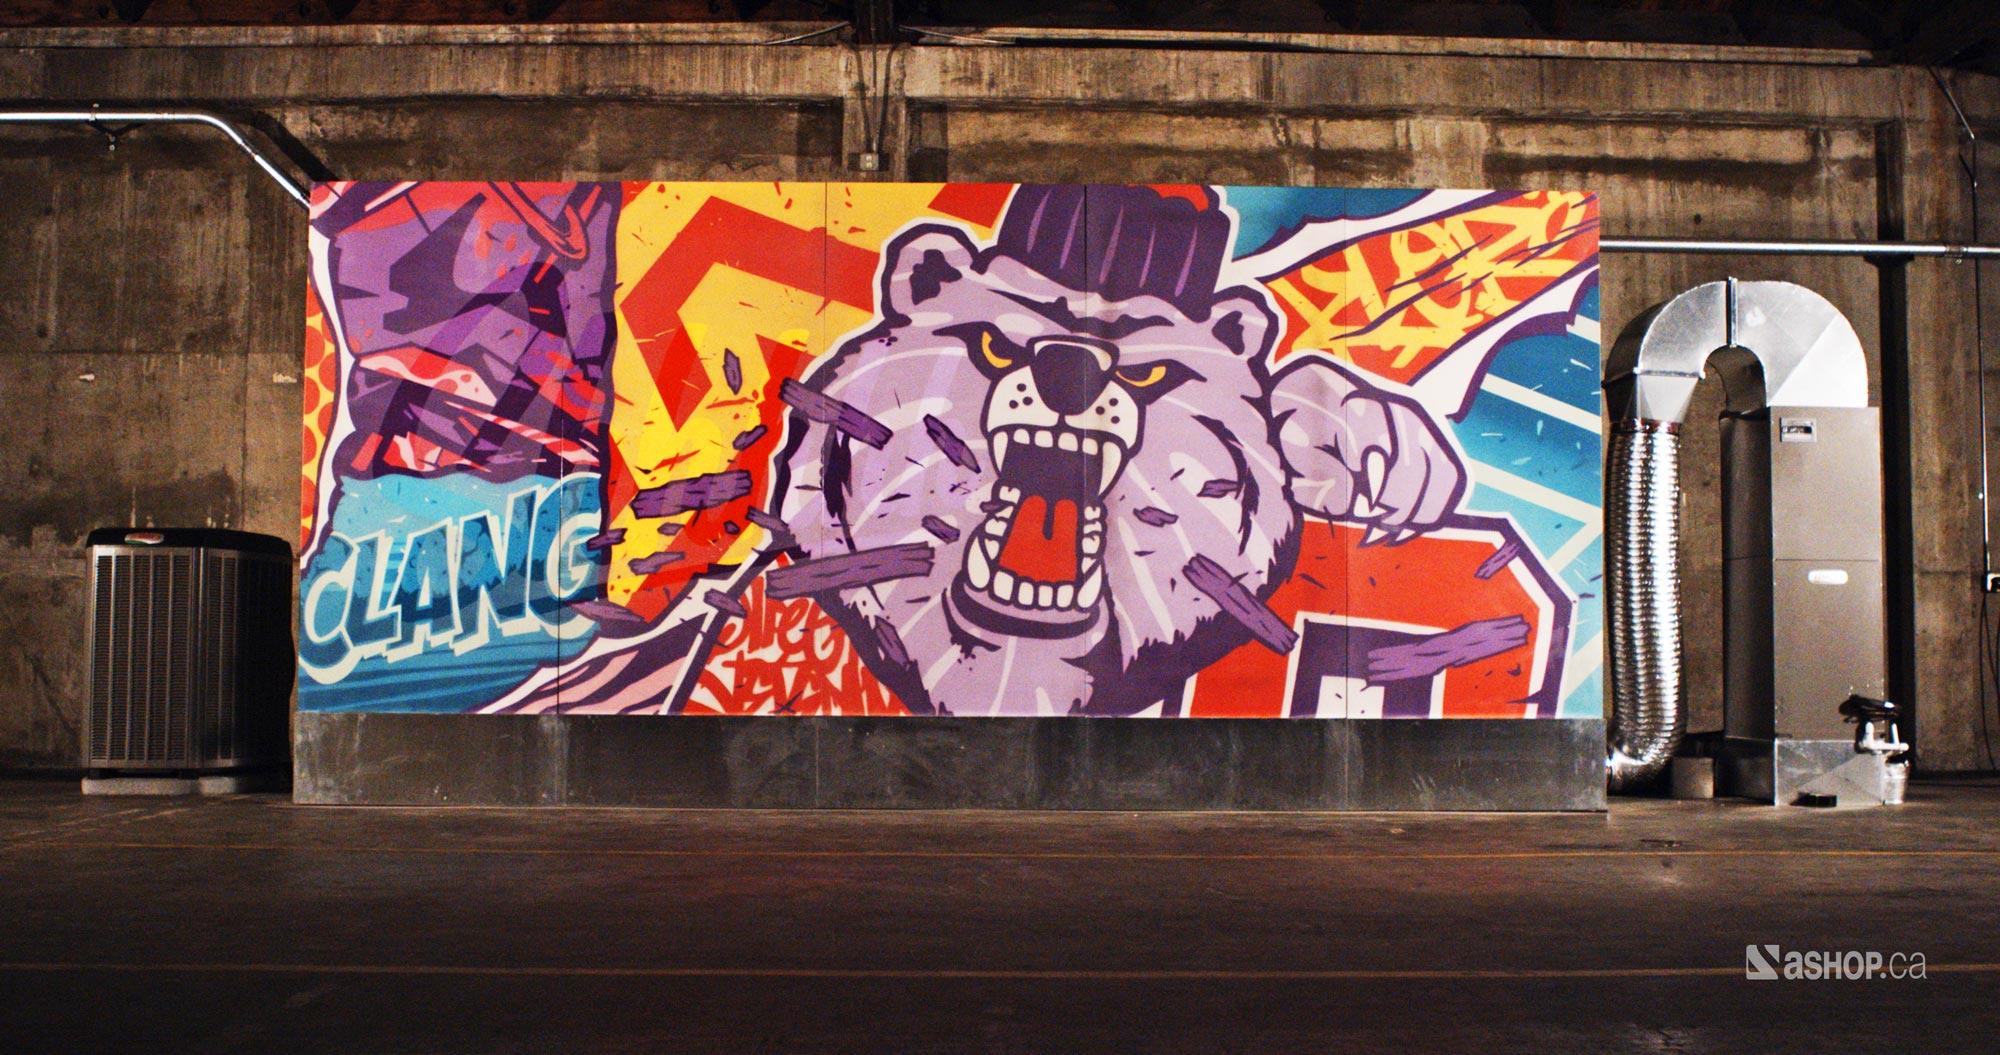 lennox_123klan_before_ashop_a'shop_mural_murales_graffiti_street_art_montreal_paint_WEB.jpg